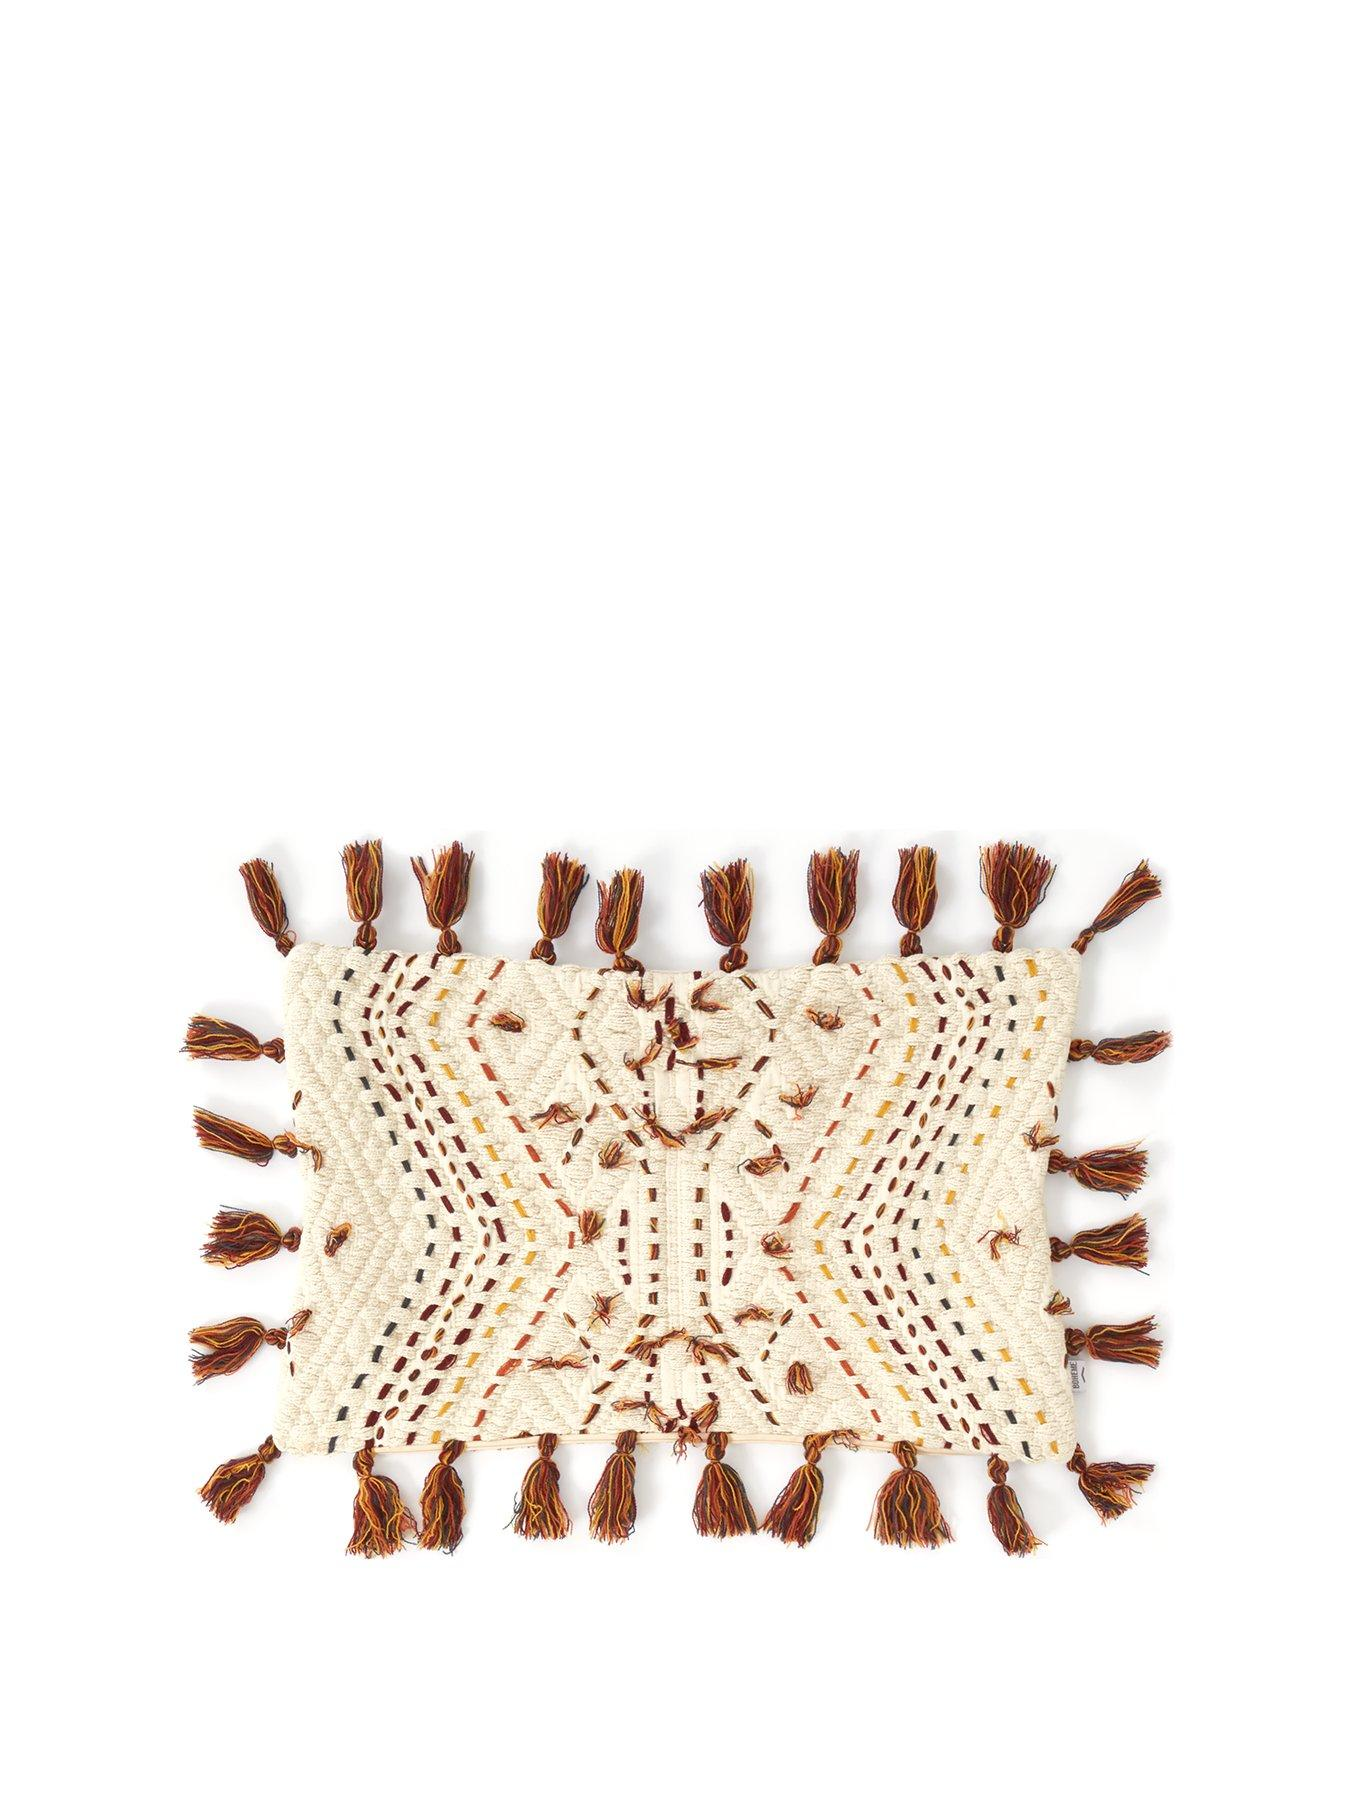 Paracas Hand Embroidered Cushion